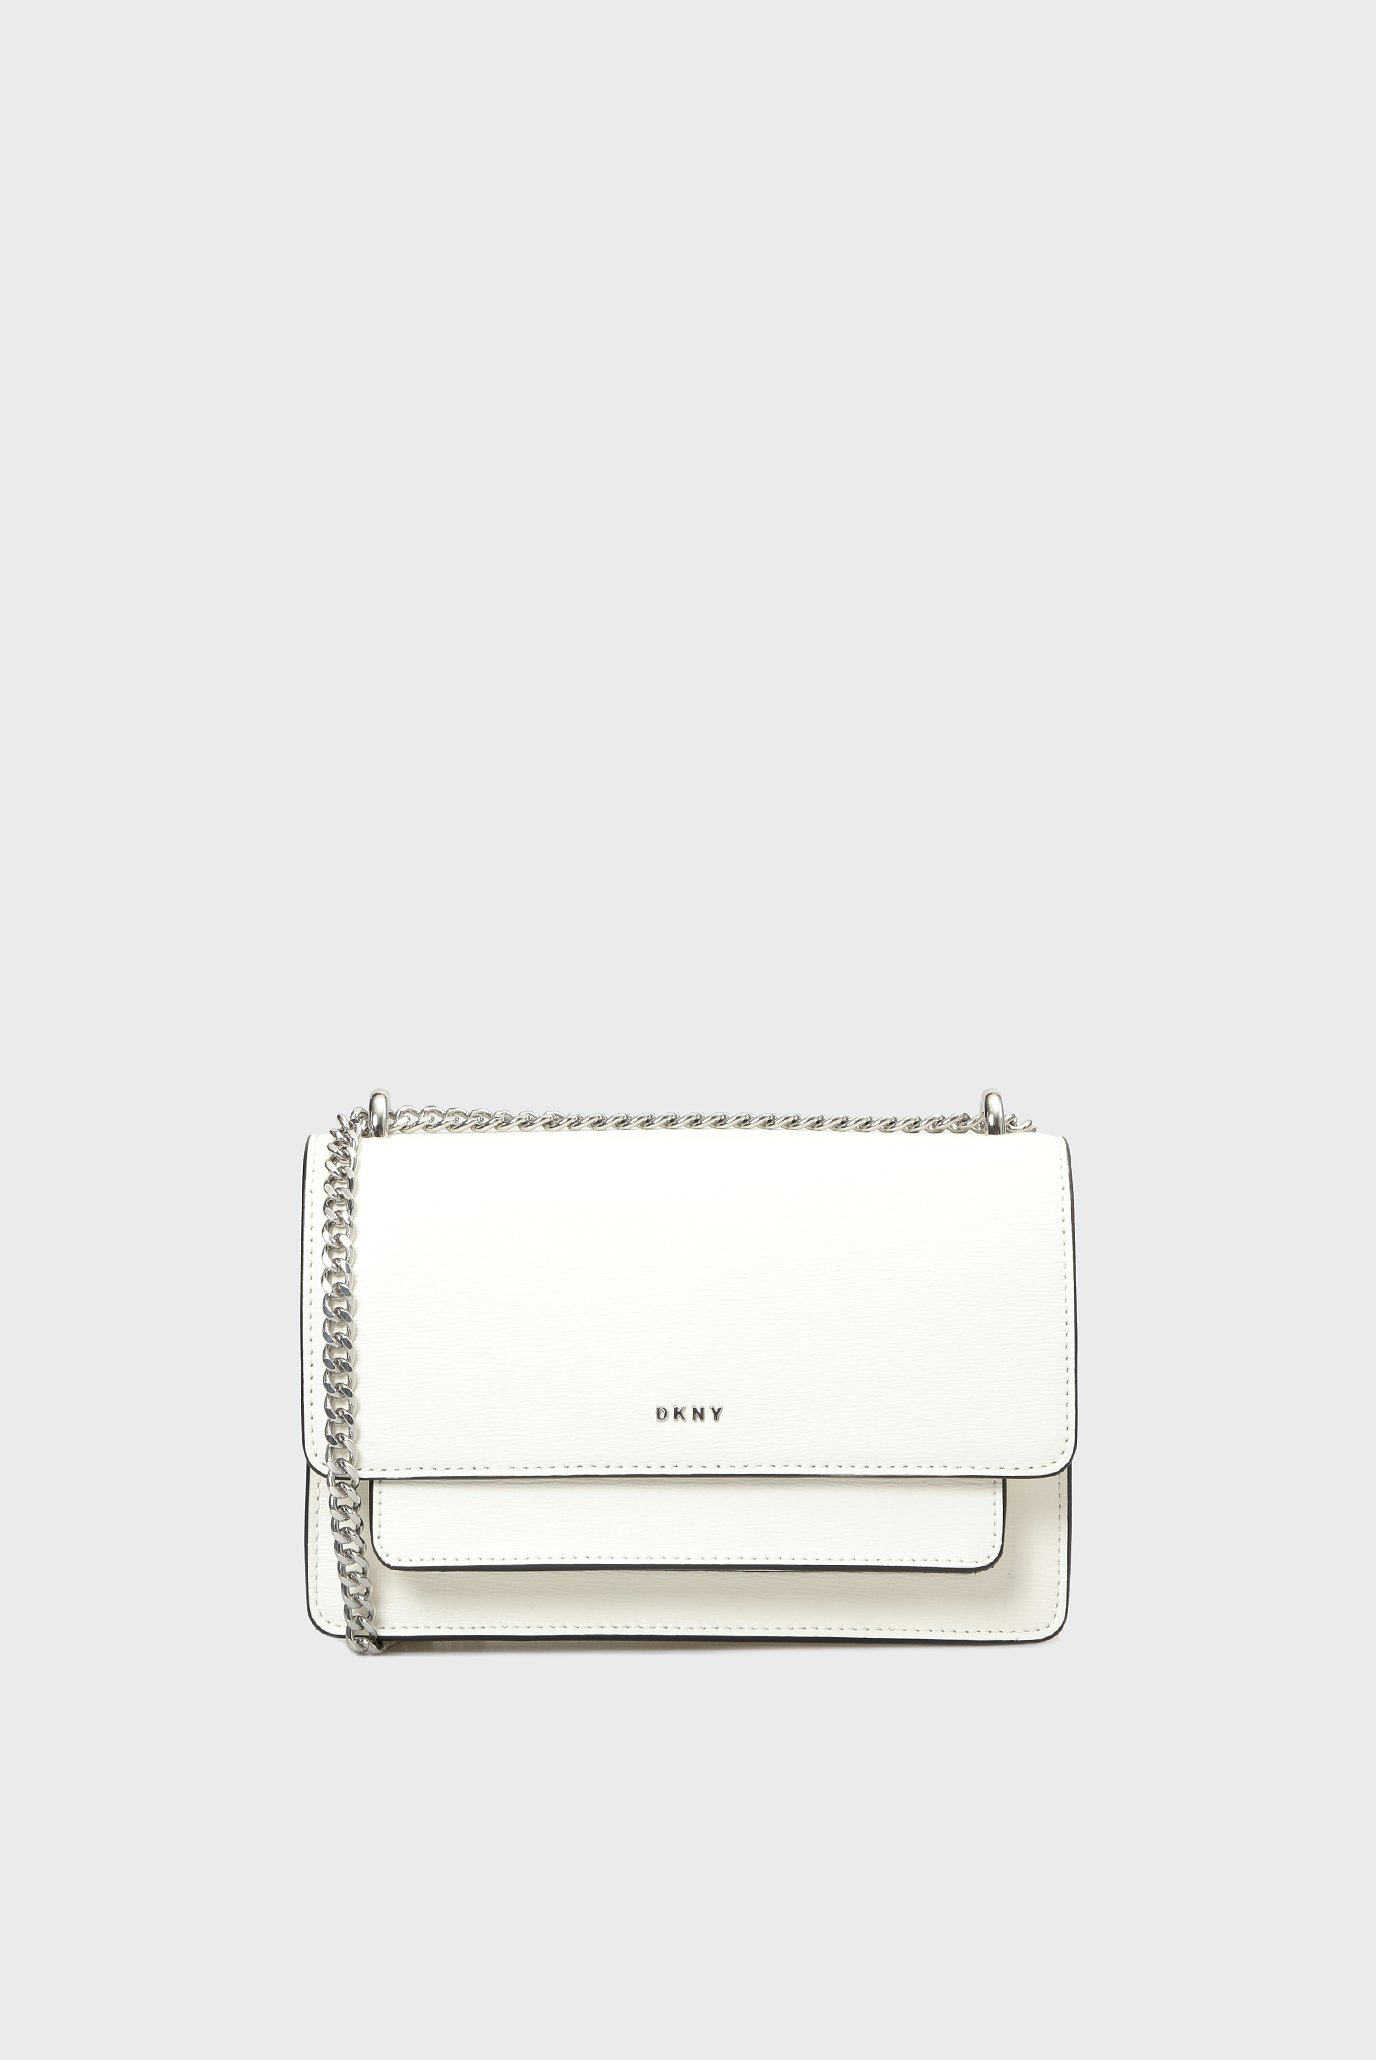 575a9dcd4134 Купить Женская белая кожаная сумка через плечо BRYANT-SM DKNY DKNY R91E3A90  – Киев, Украина. Цены в интернет магазине MD Fashion